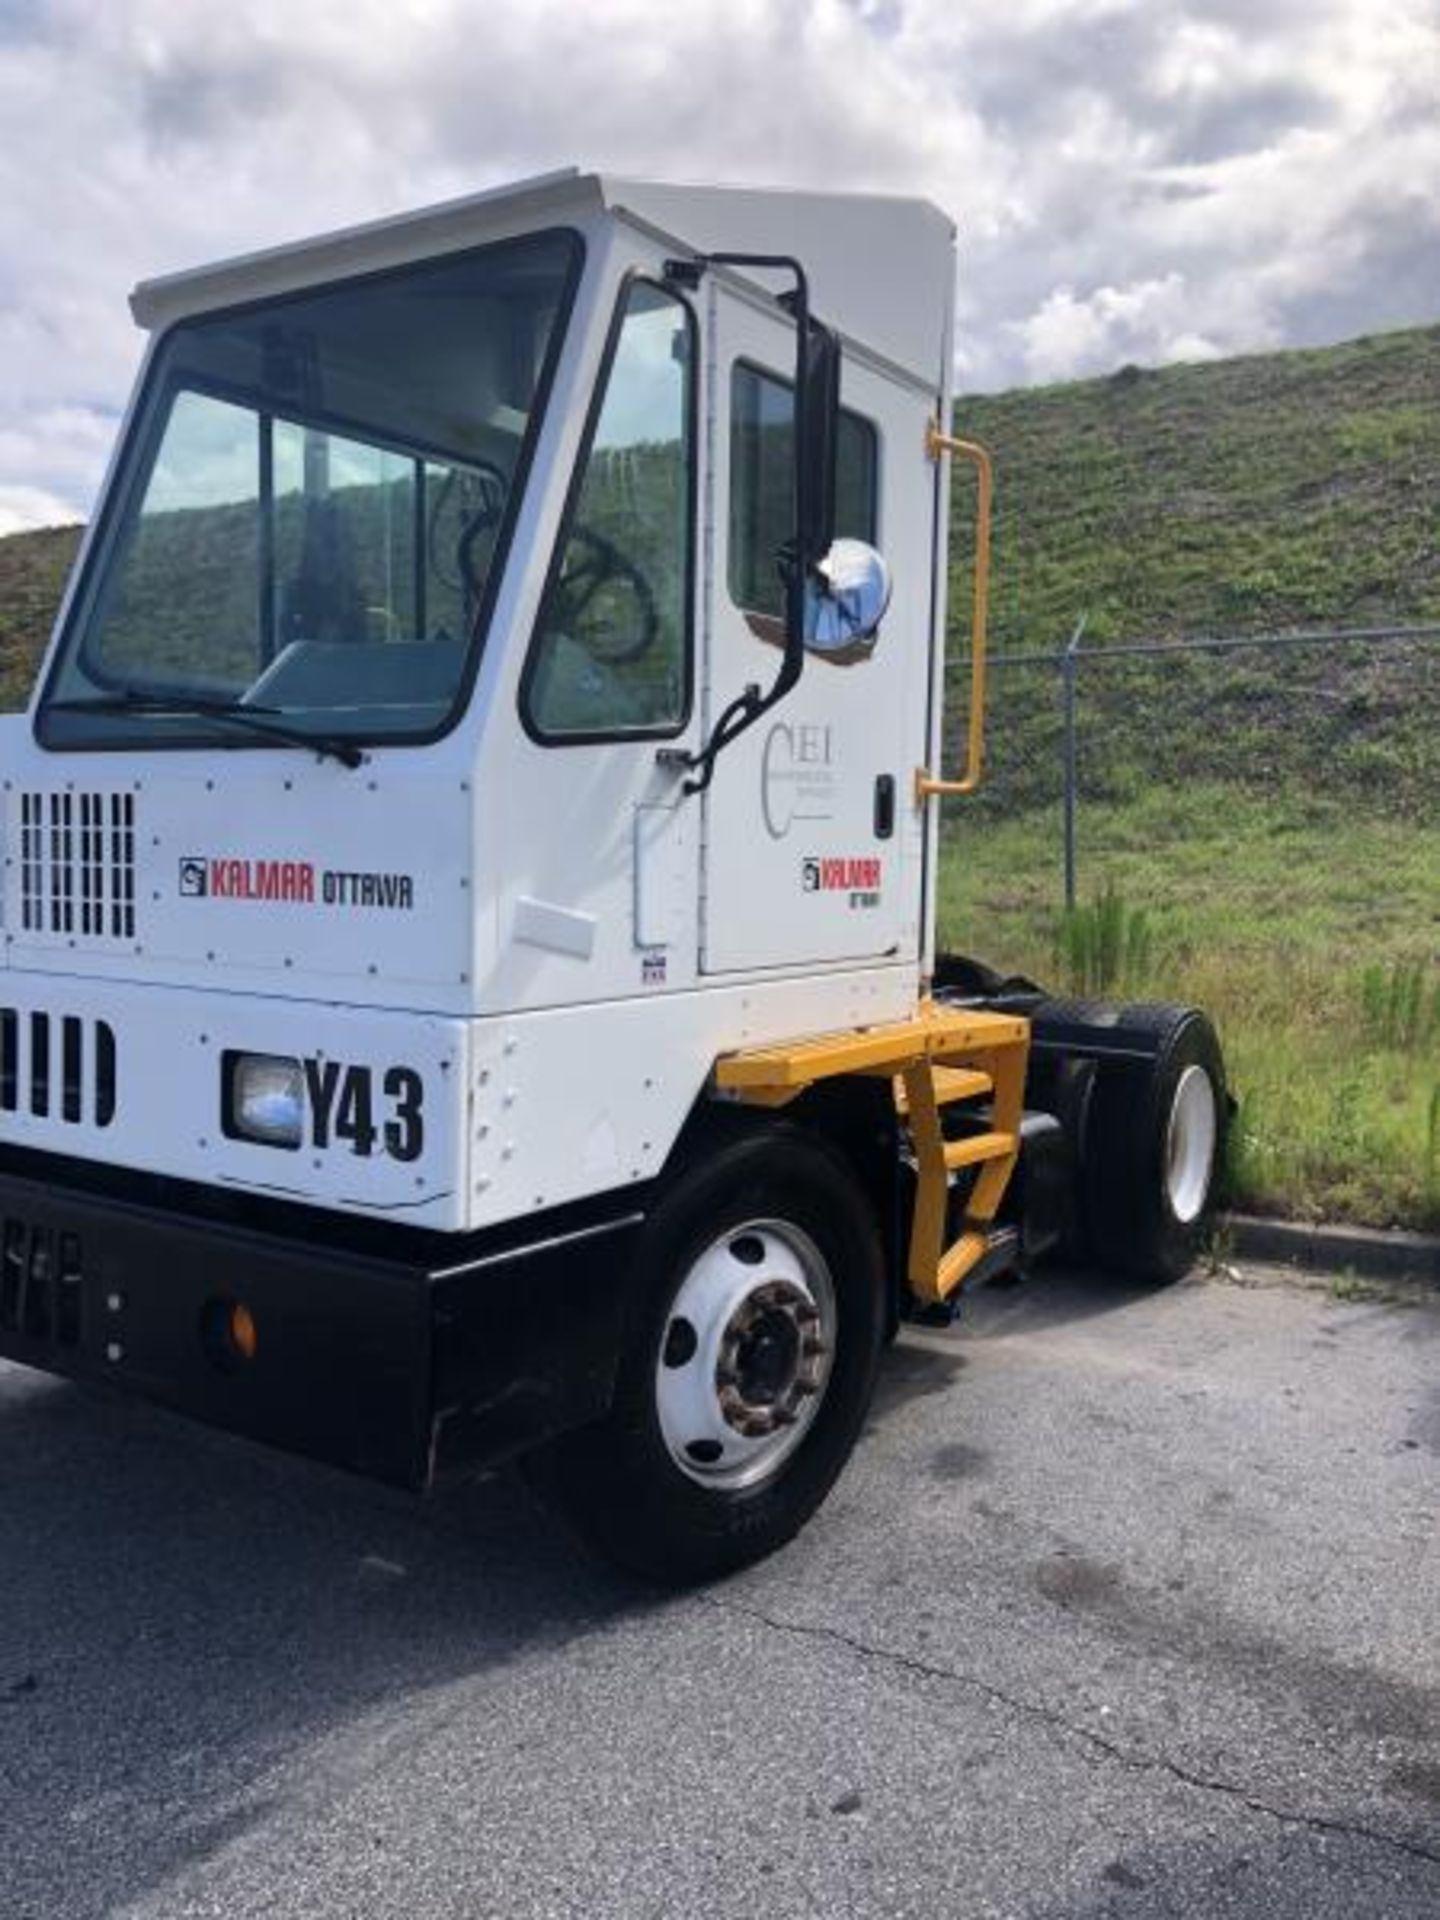 2015 Kalmar Ottawa 4x2 Yard Truck , SN: 338837 3,239.3 Hours, 3,125 Miles - Image 5 of 32